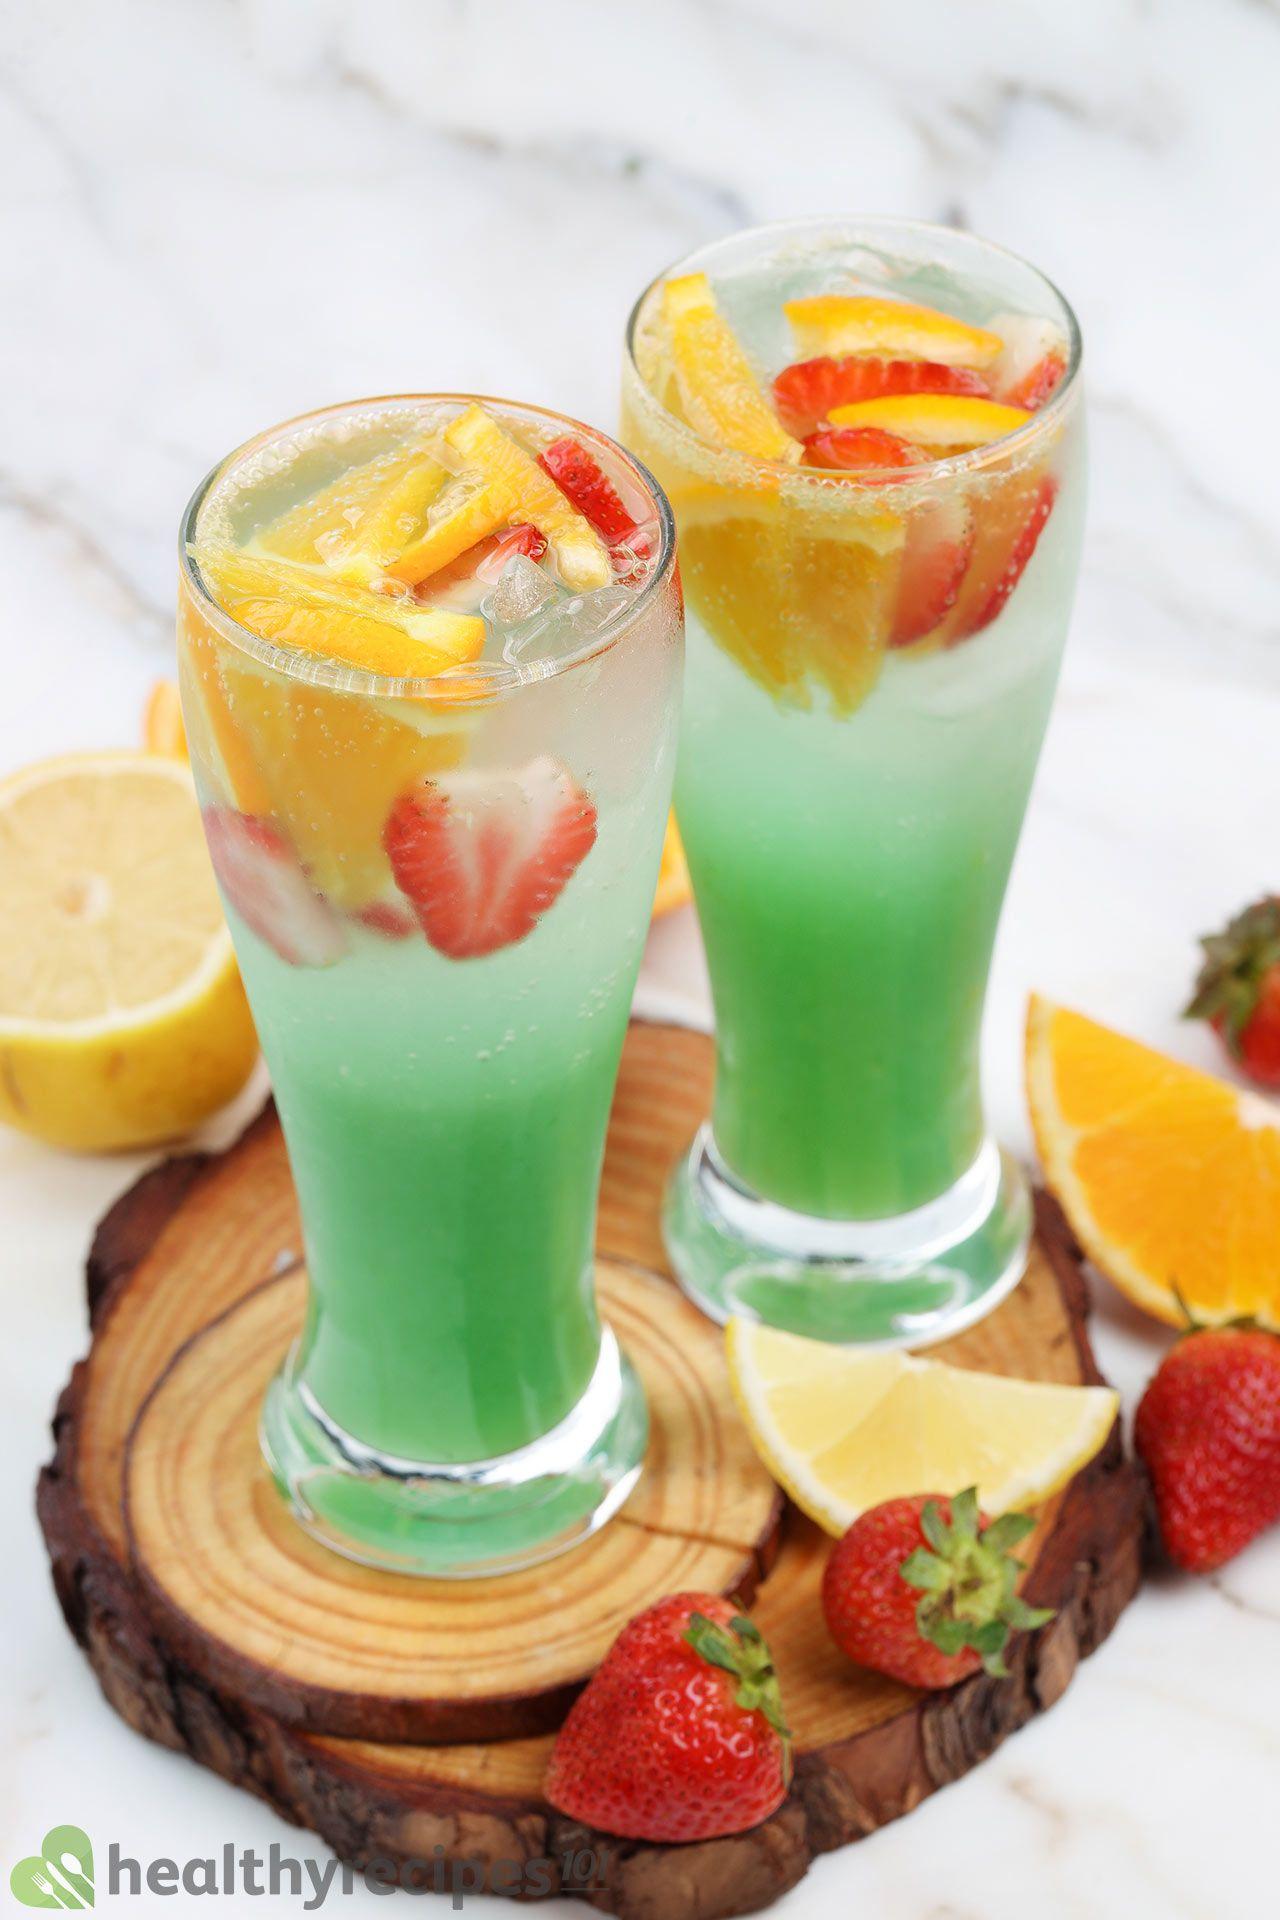 homemade green jungle juice recipe